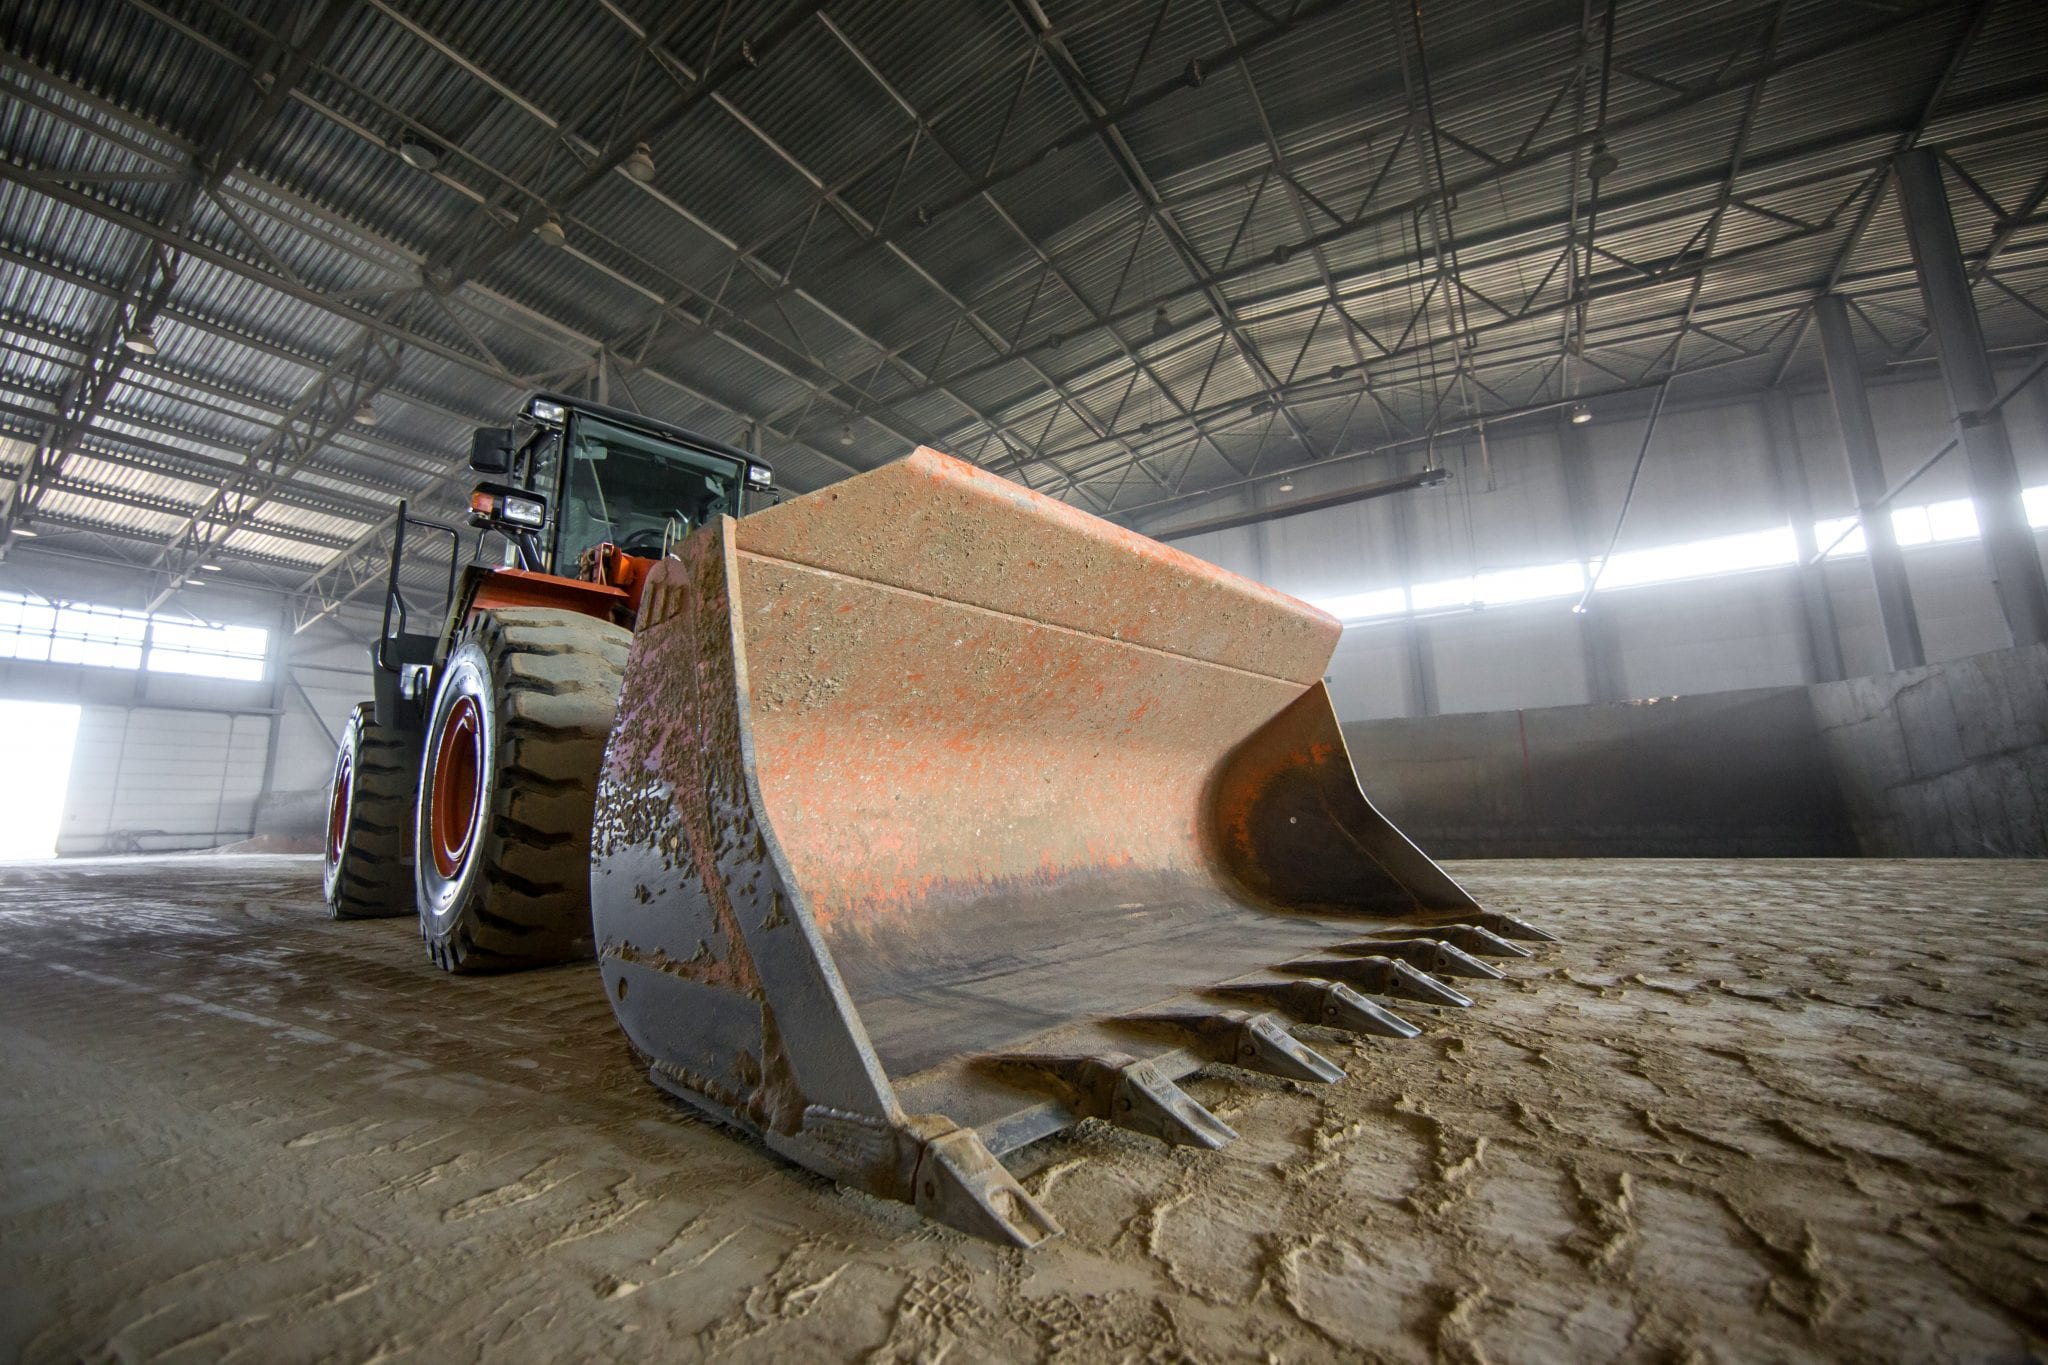 Large front loader tractor